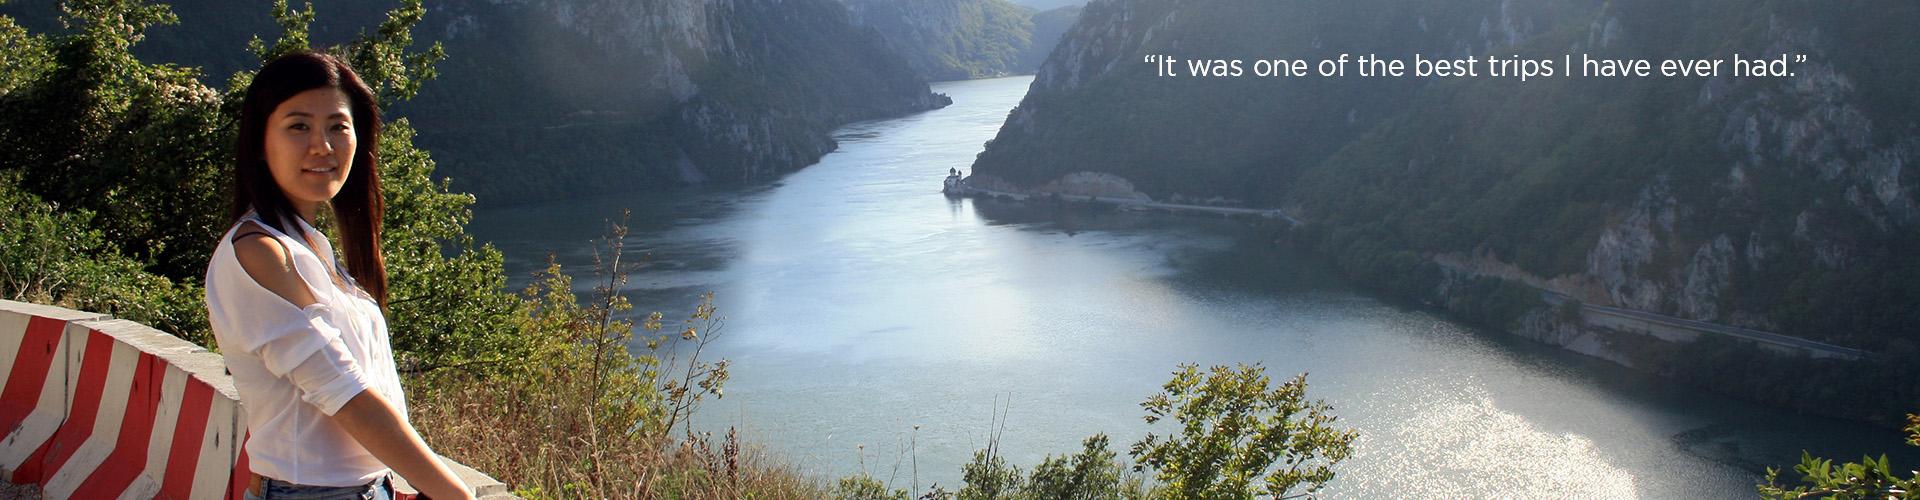 Iron-gate-Danube